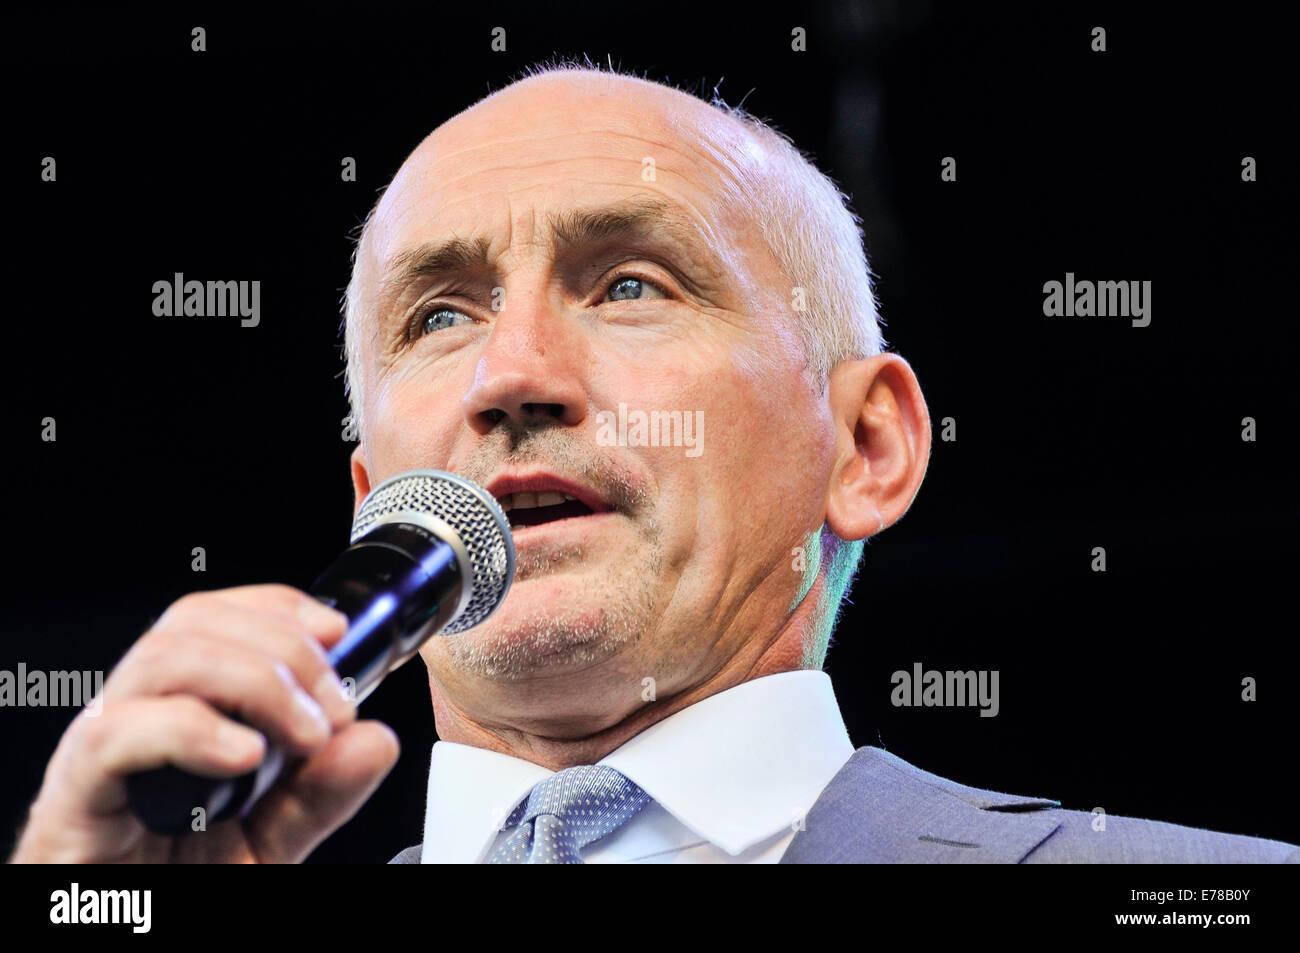 Belfast, Northern Ireland. 9 Sep 2014 - Former boxing world champion Barry McGuigan Credit:  Stephen Barnes/Alamy - Stock Image